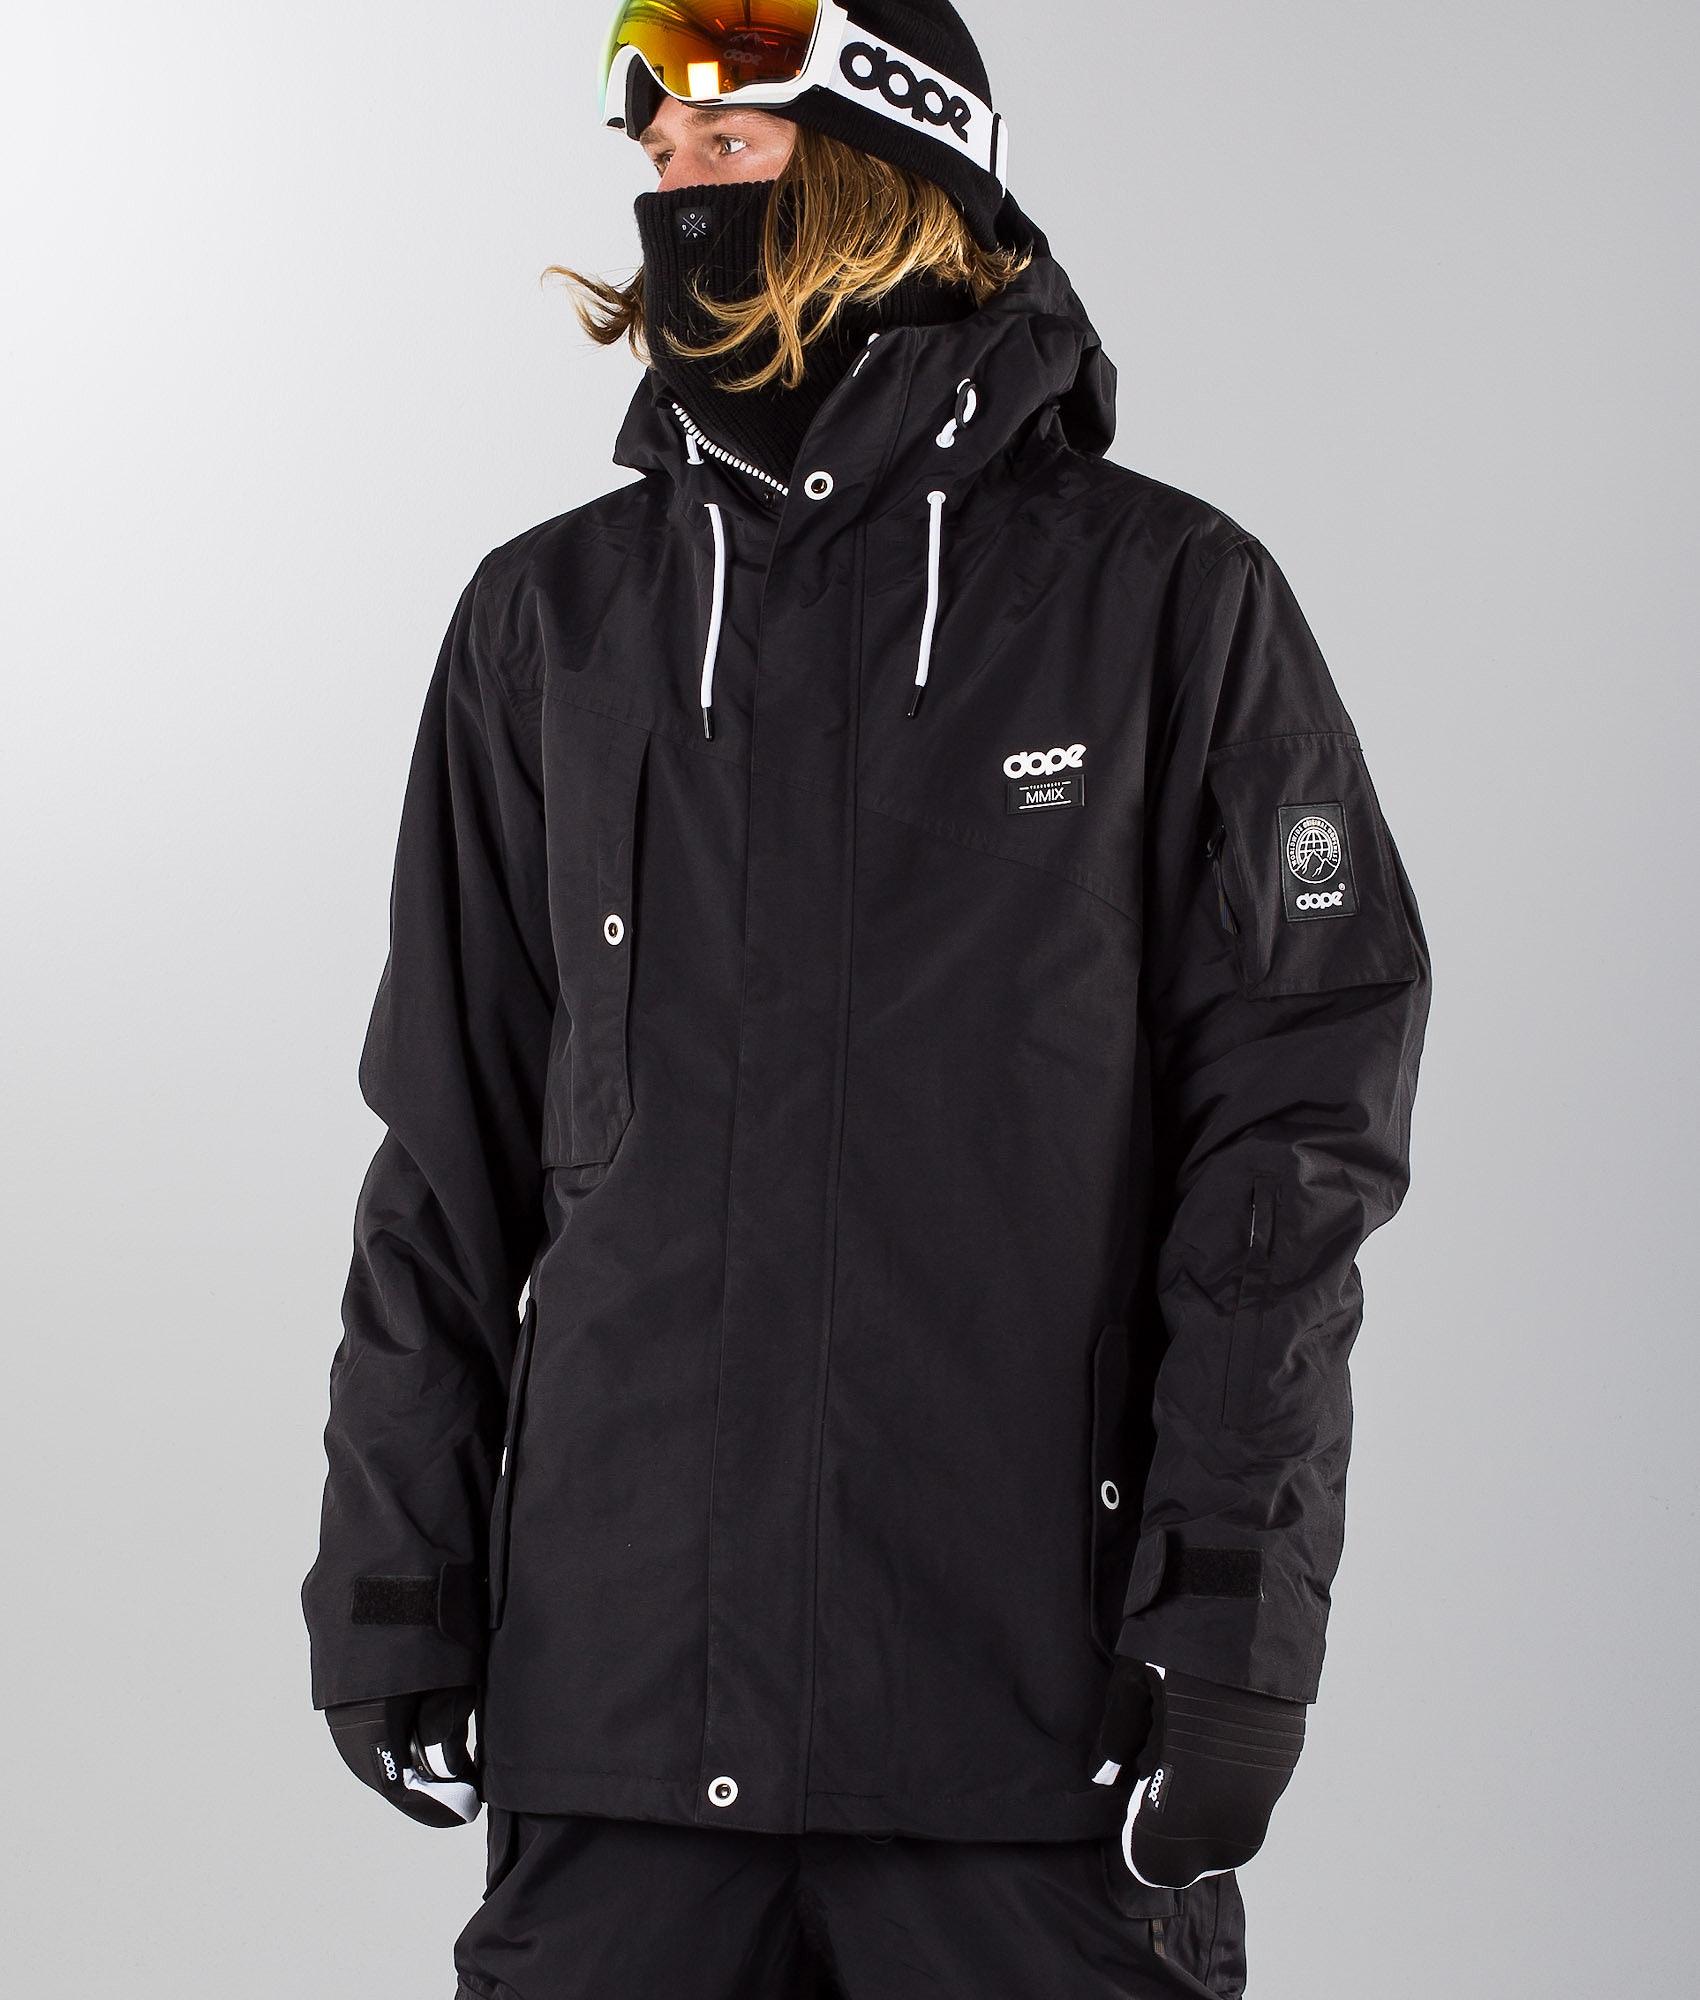 Dope snow - snowboardkläder   skidkläder - Ridestore.se b671645441e66